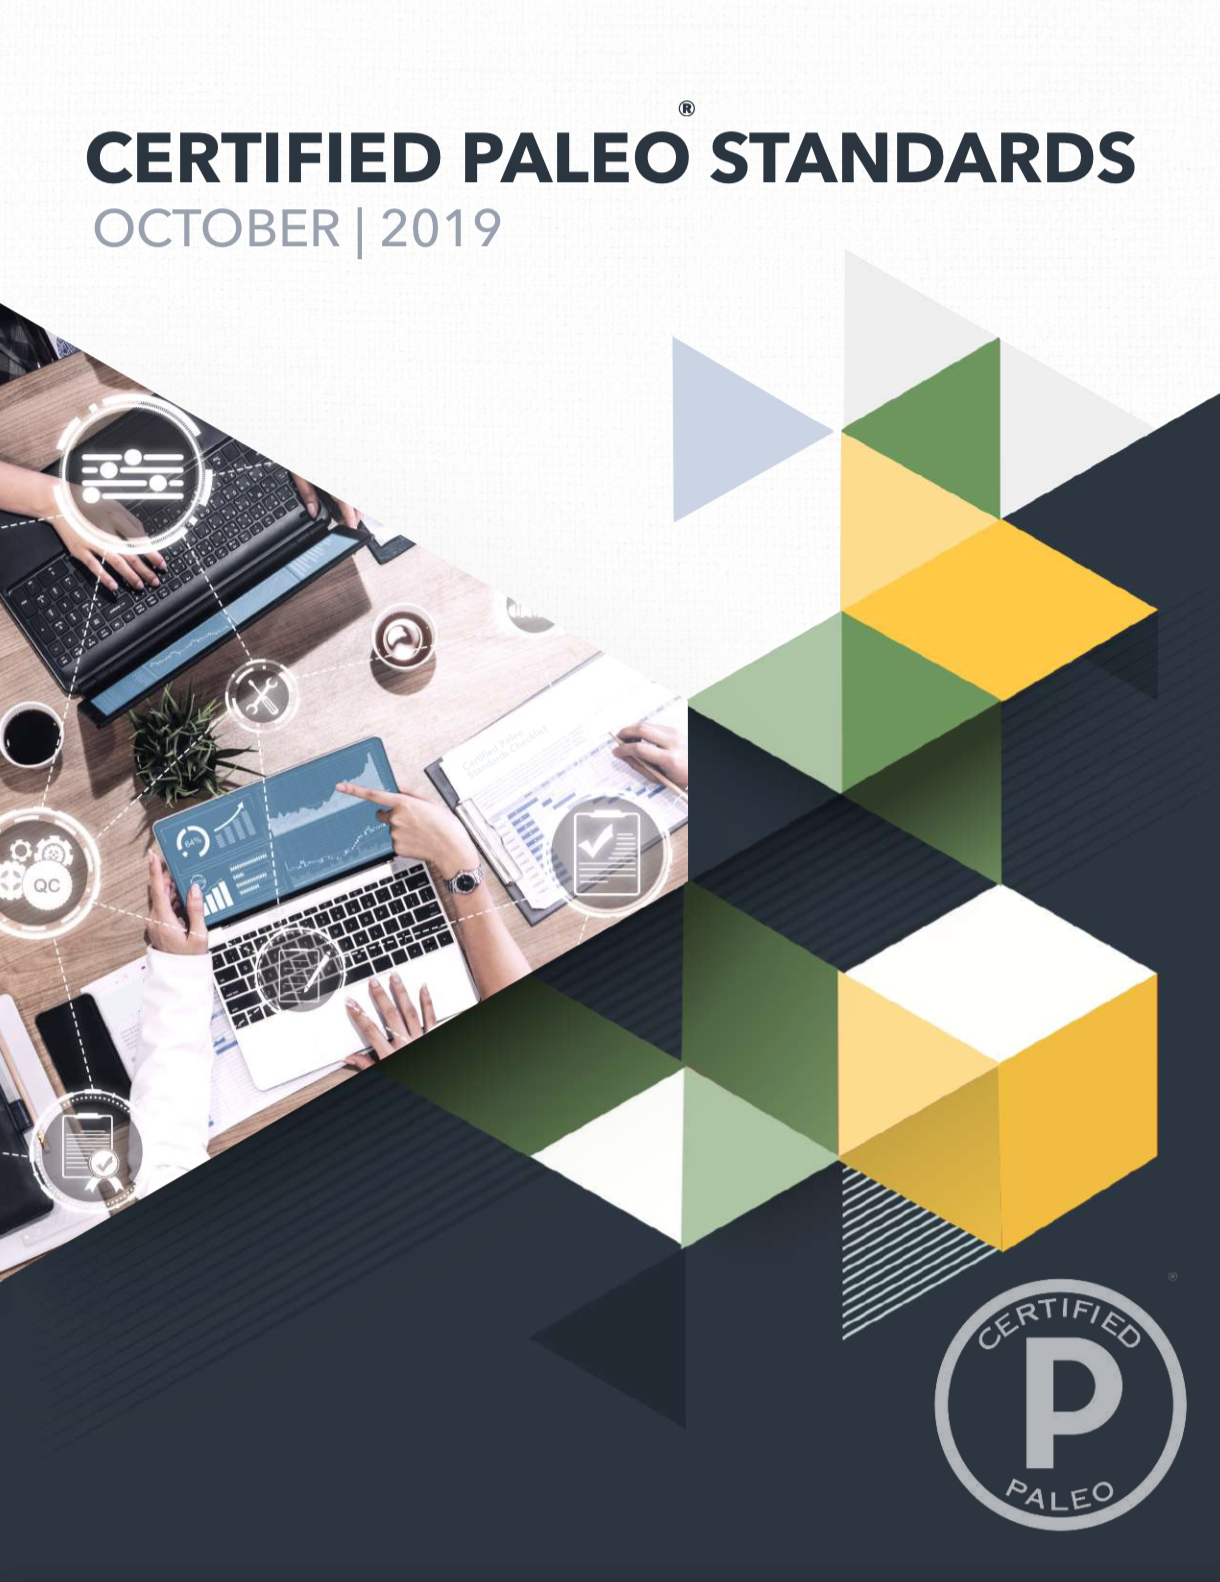 Certified Paleo Standards 2019